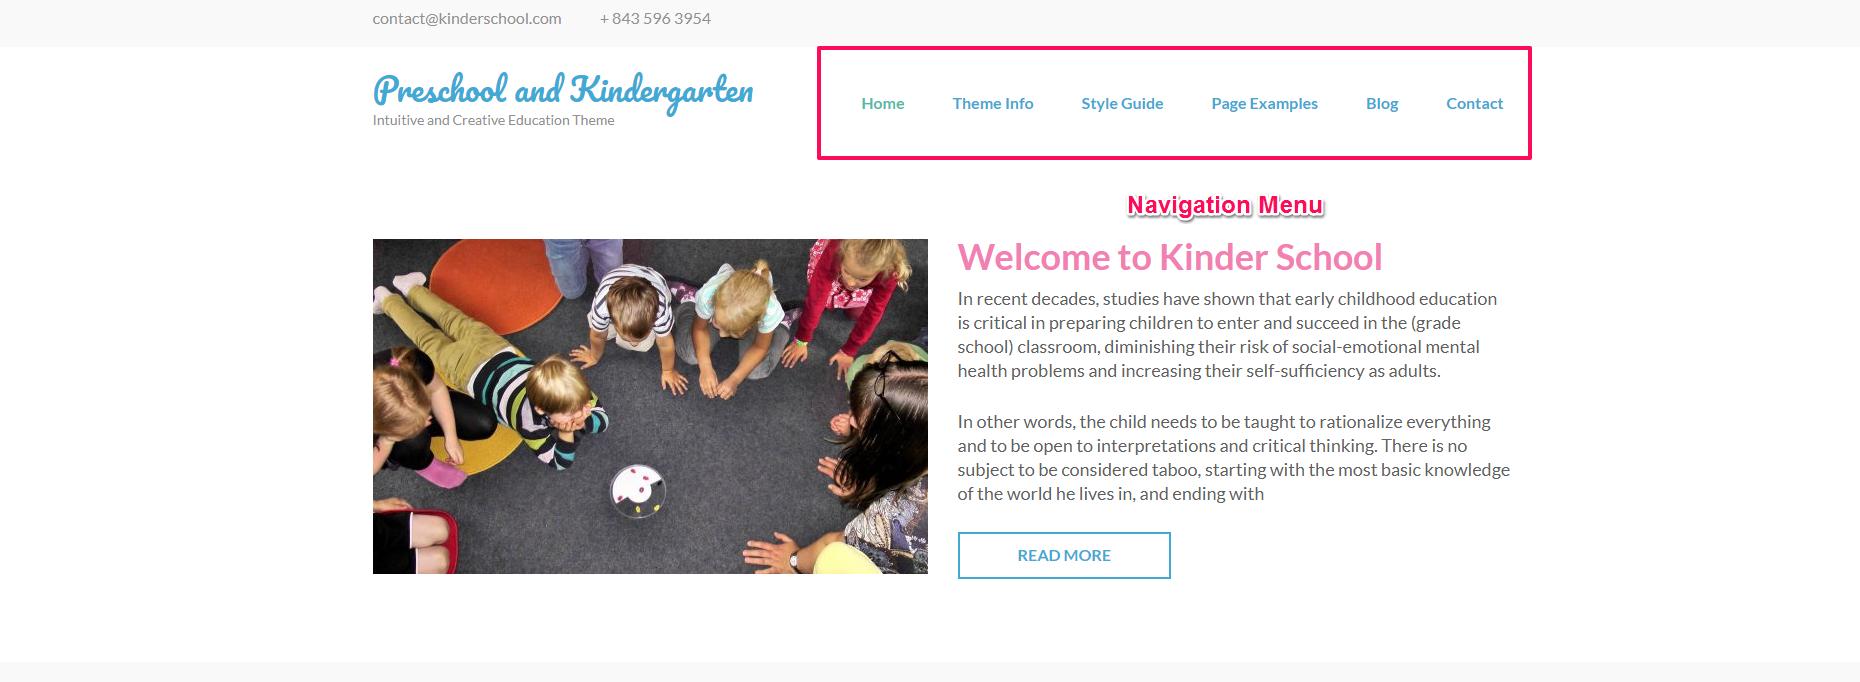 navigation menu for preschool and kindergarten